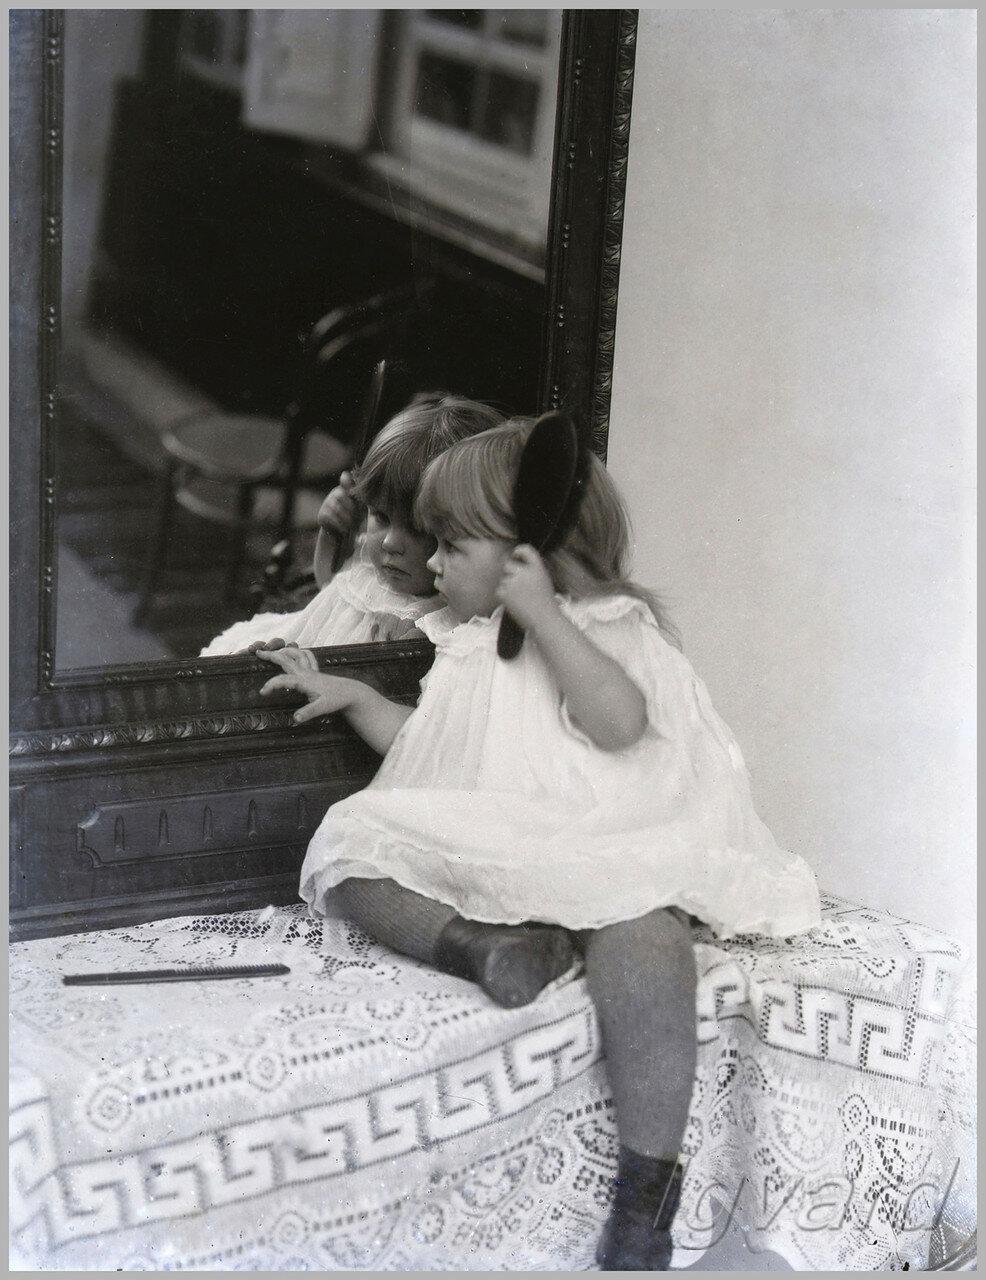 Девочка у зеркала (конкурсное фото Алексея Васильевича Барышникова)